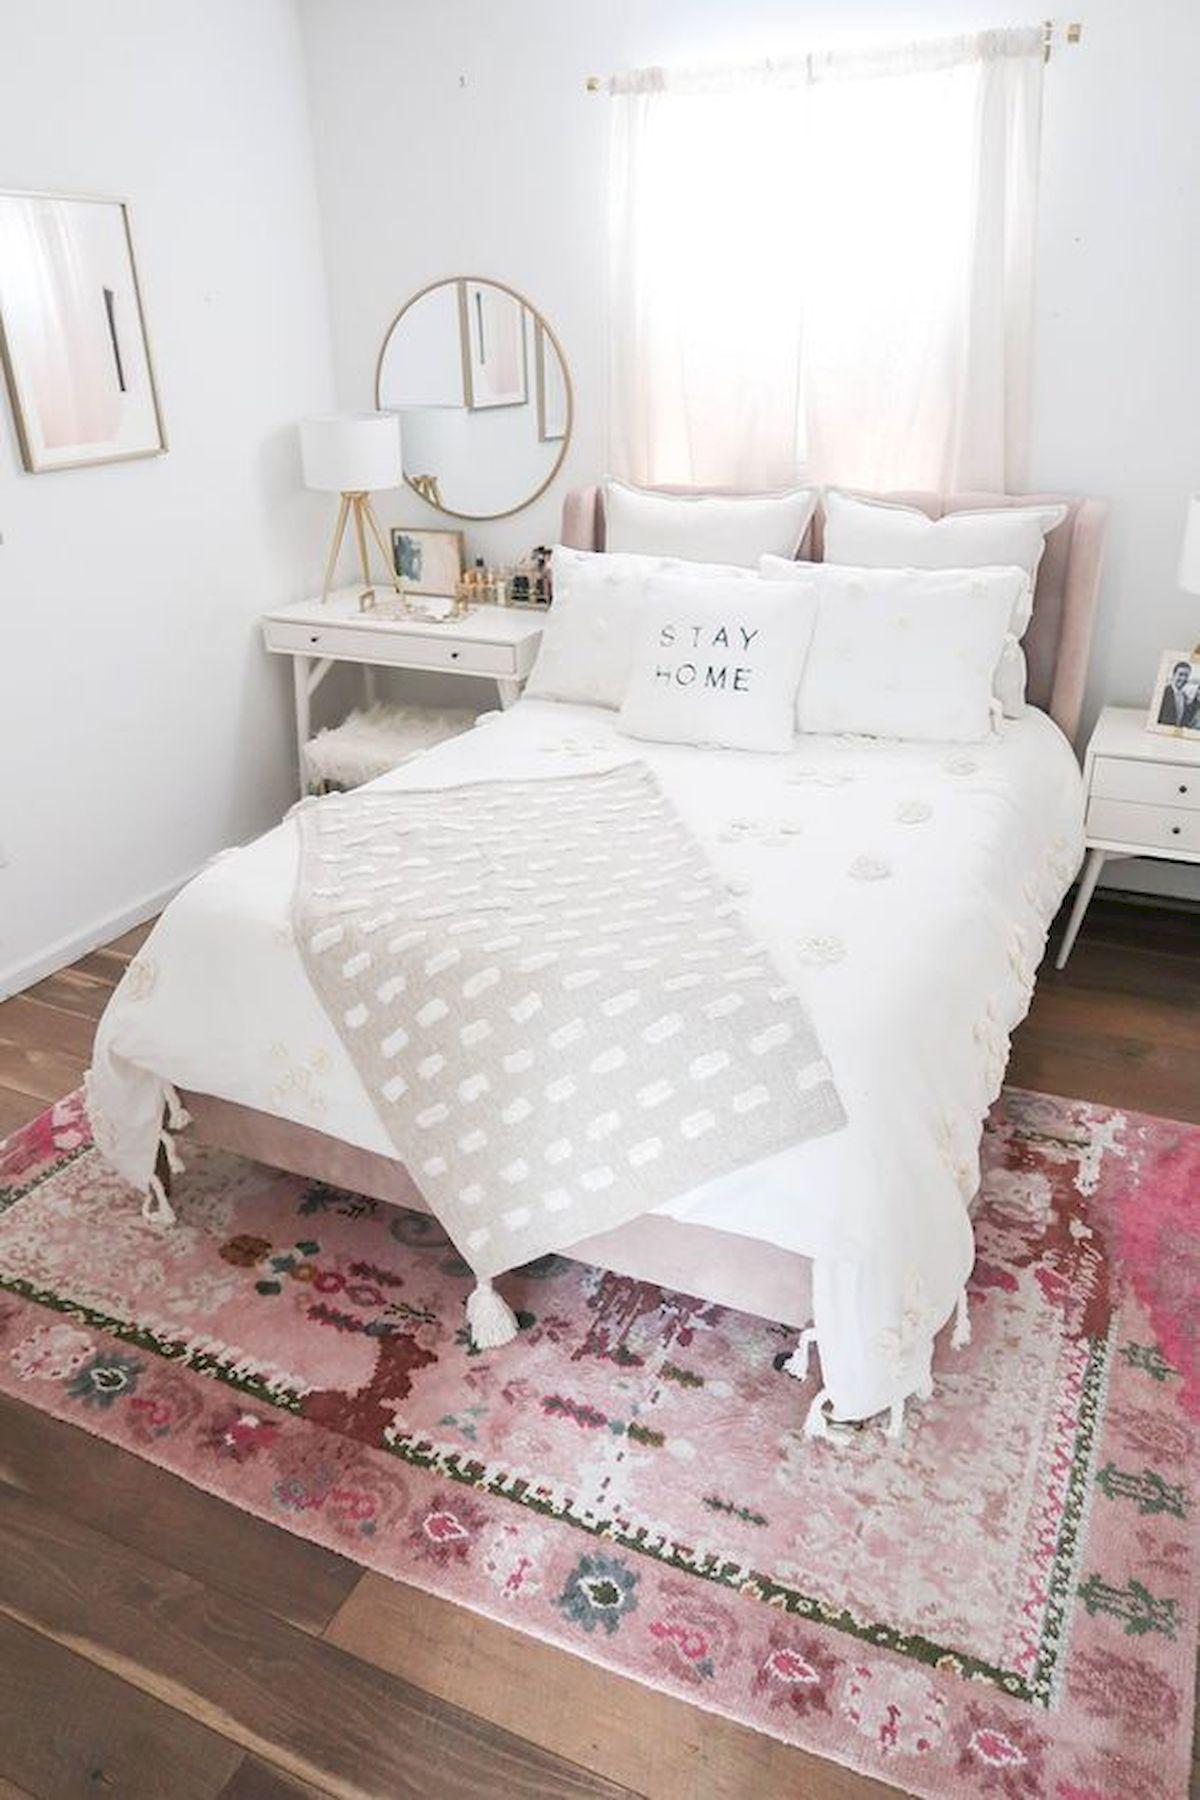 60 Beautiful Bedroom Decor and Design Ideas (58)